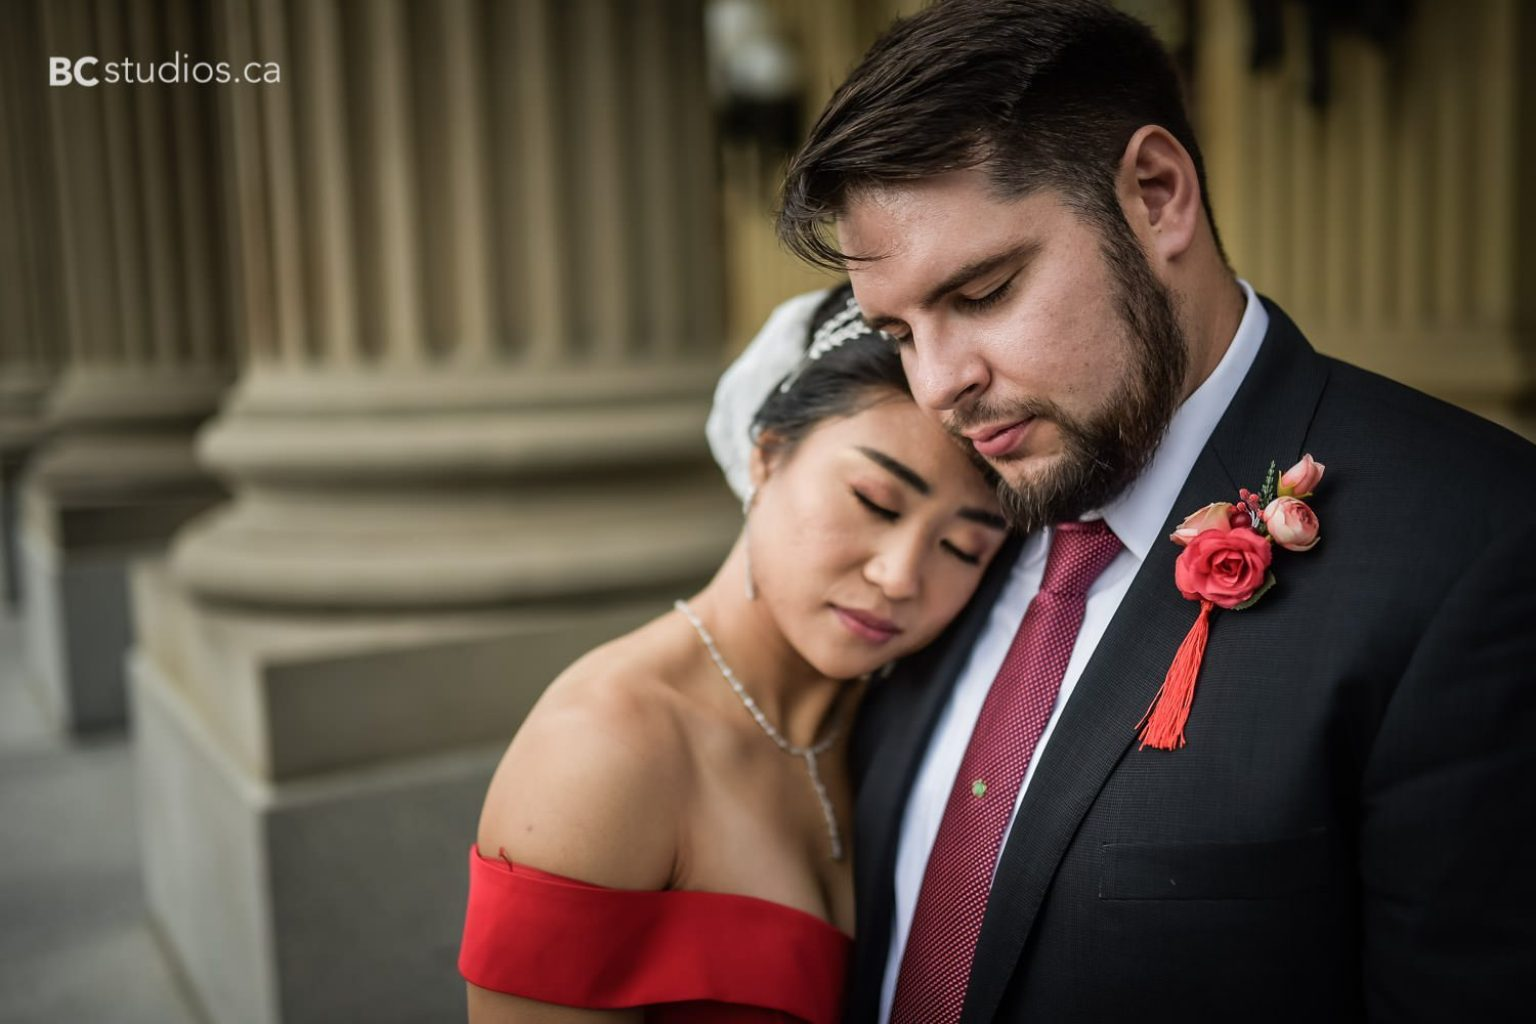 red wedding dress. chinese. alberta legislature building